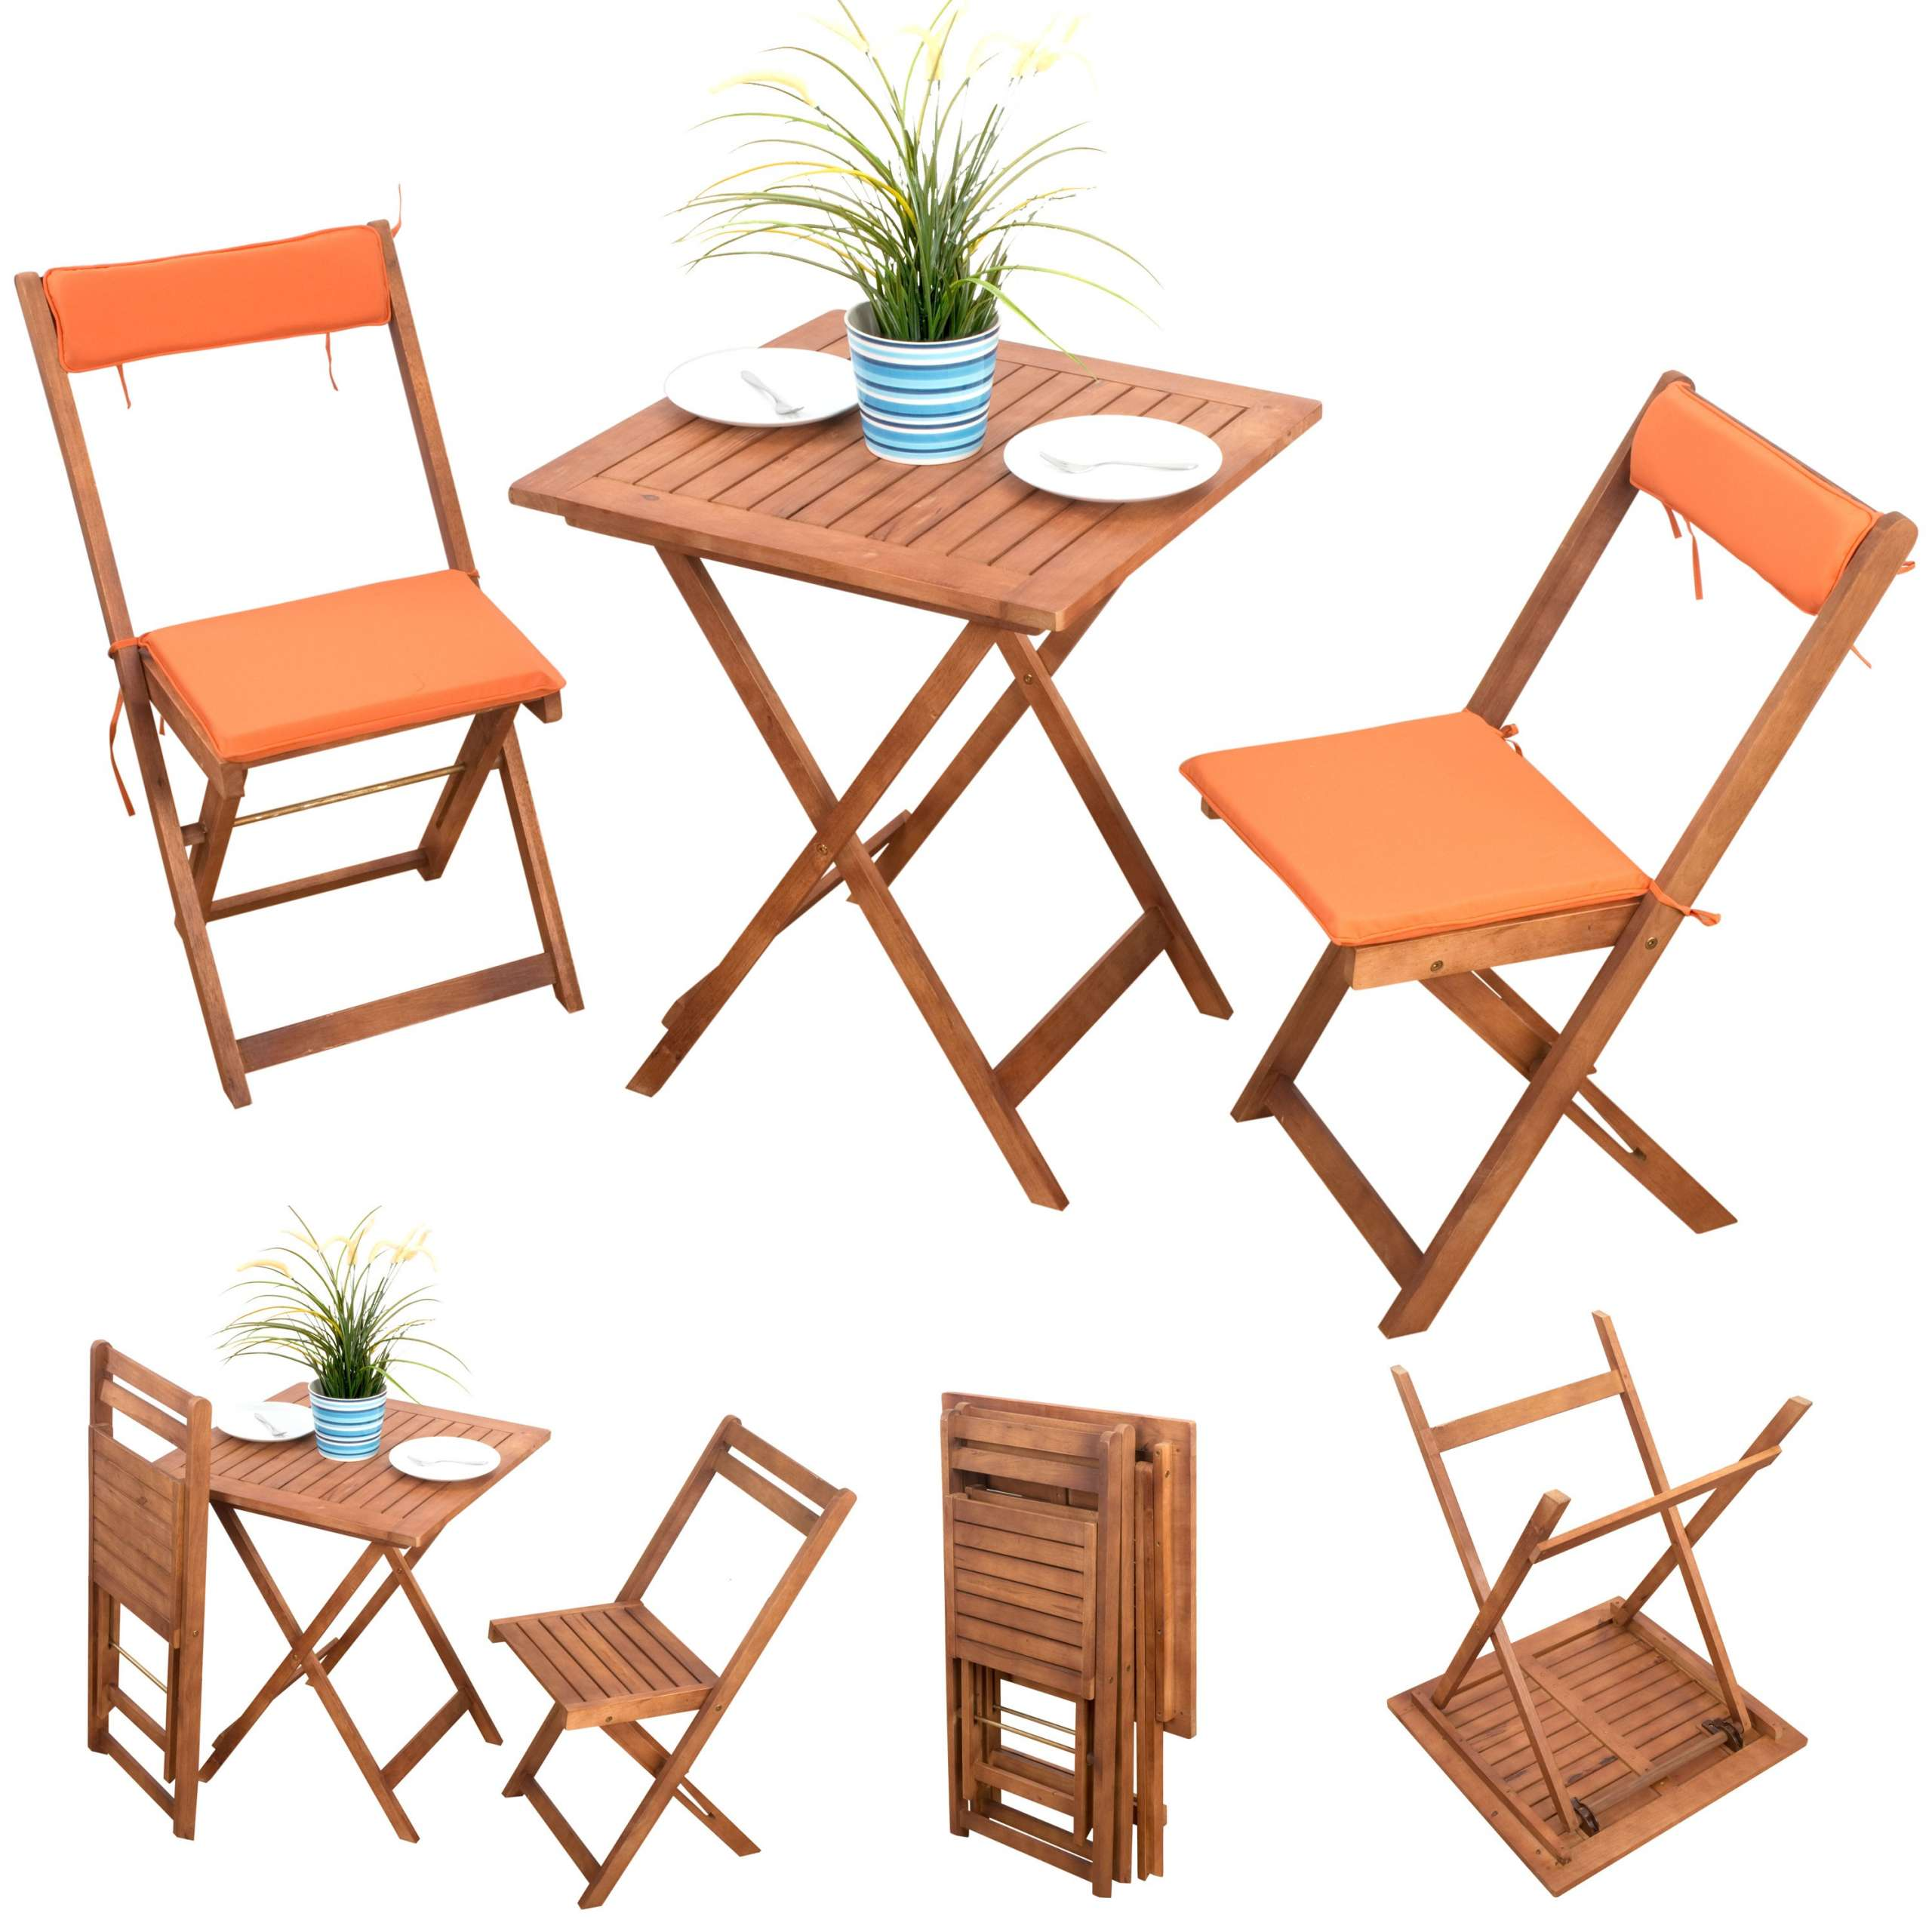 Holz Gartenmöbel Günstig ▻ günstig ◅ Holzmöbel Garten Günstig kaufen